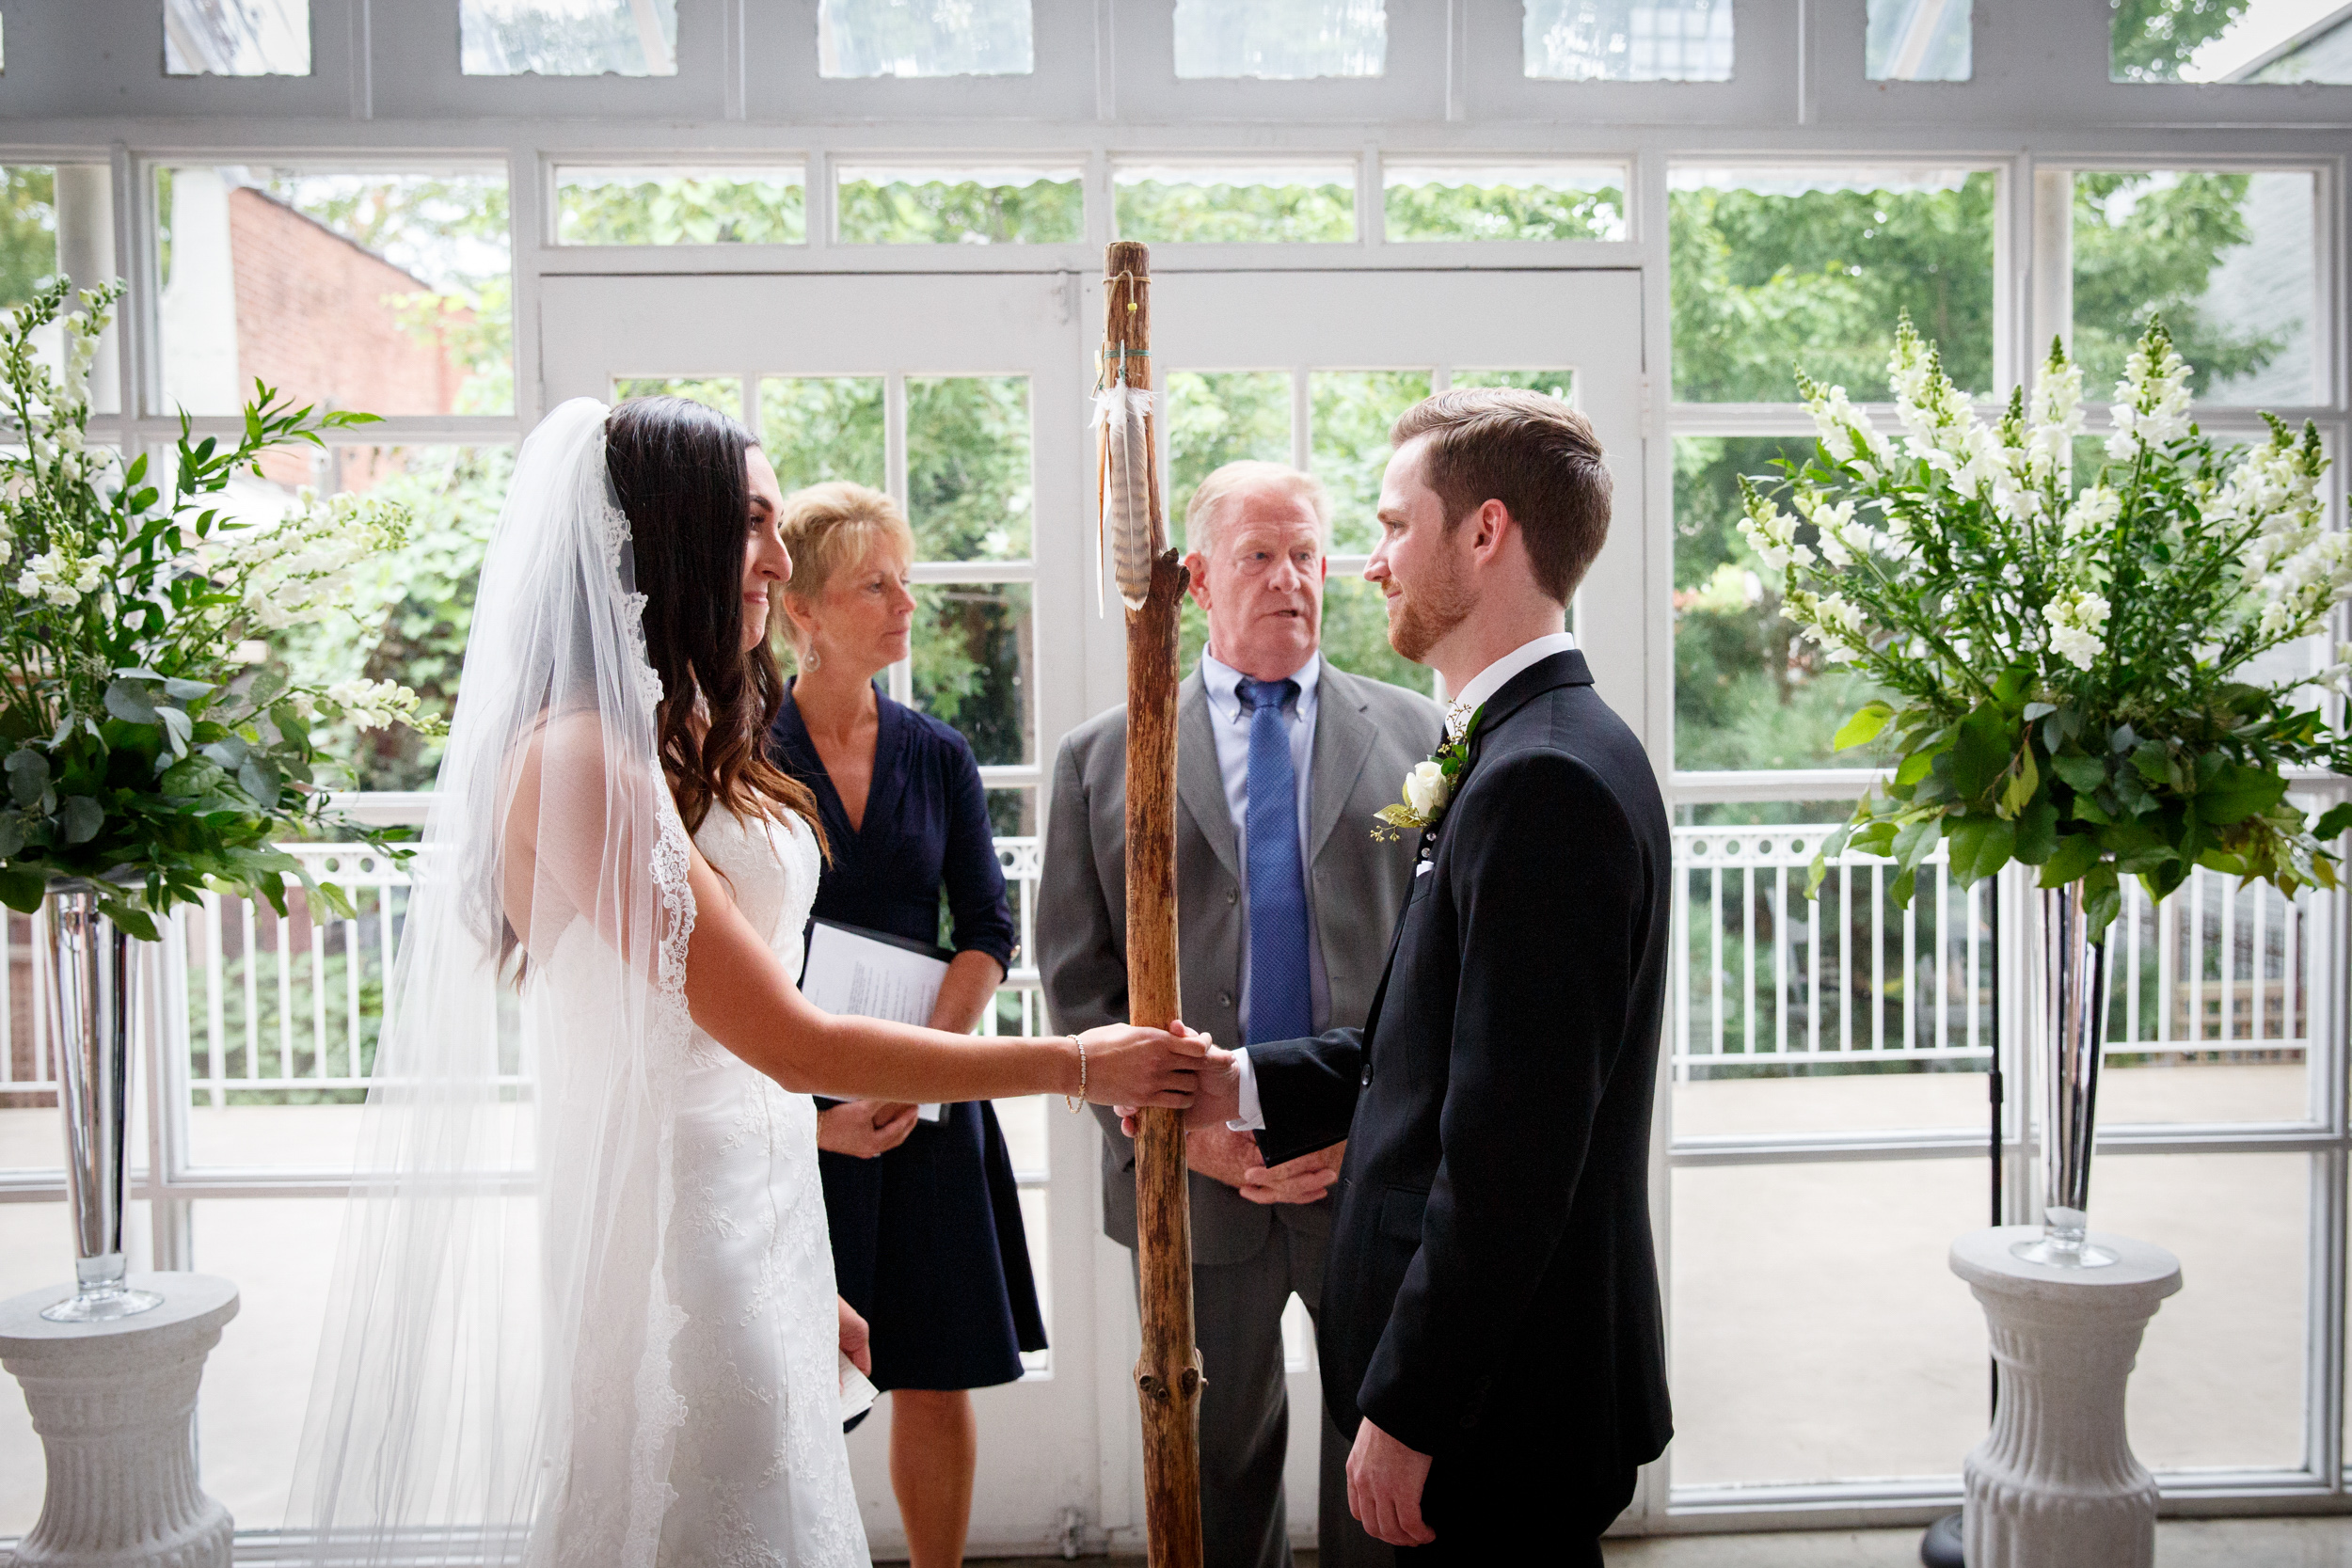 9-09-2016 Flora & Colin wedding photography by Brian Milo-142.jpg